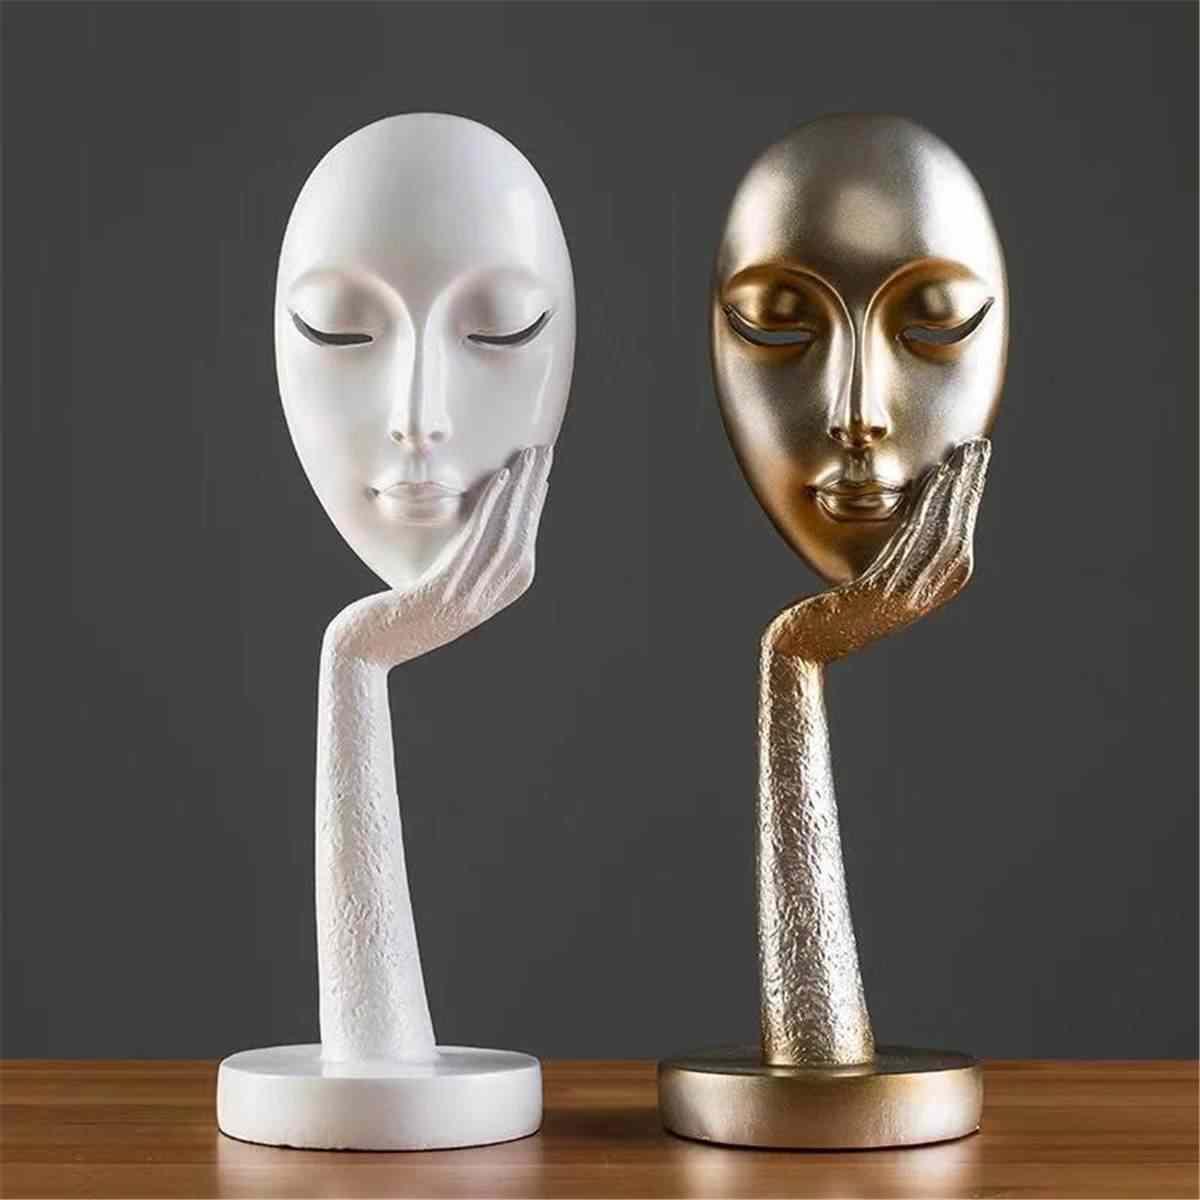 MGT] Abstract Statues Sculpture Art Crafts Modern Human Meditators  Character Resin Figurine Lady Face Home Decorative|Statues & Sculptures| -  AliExpress